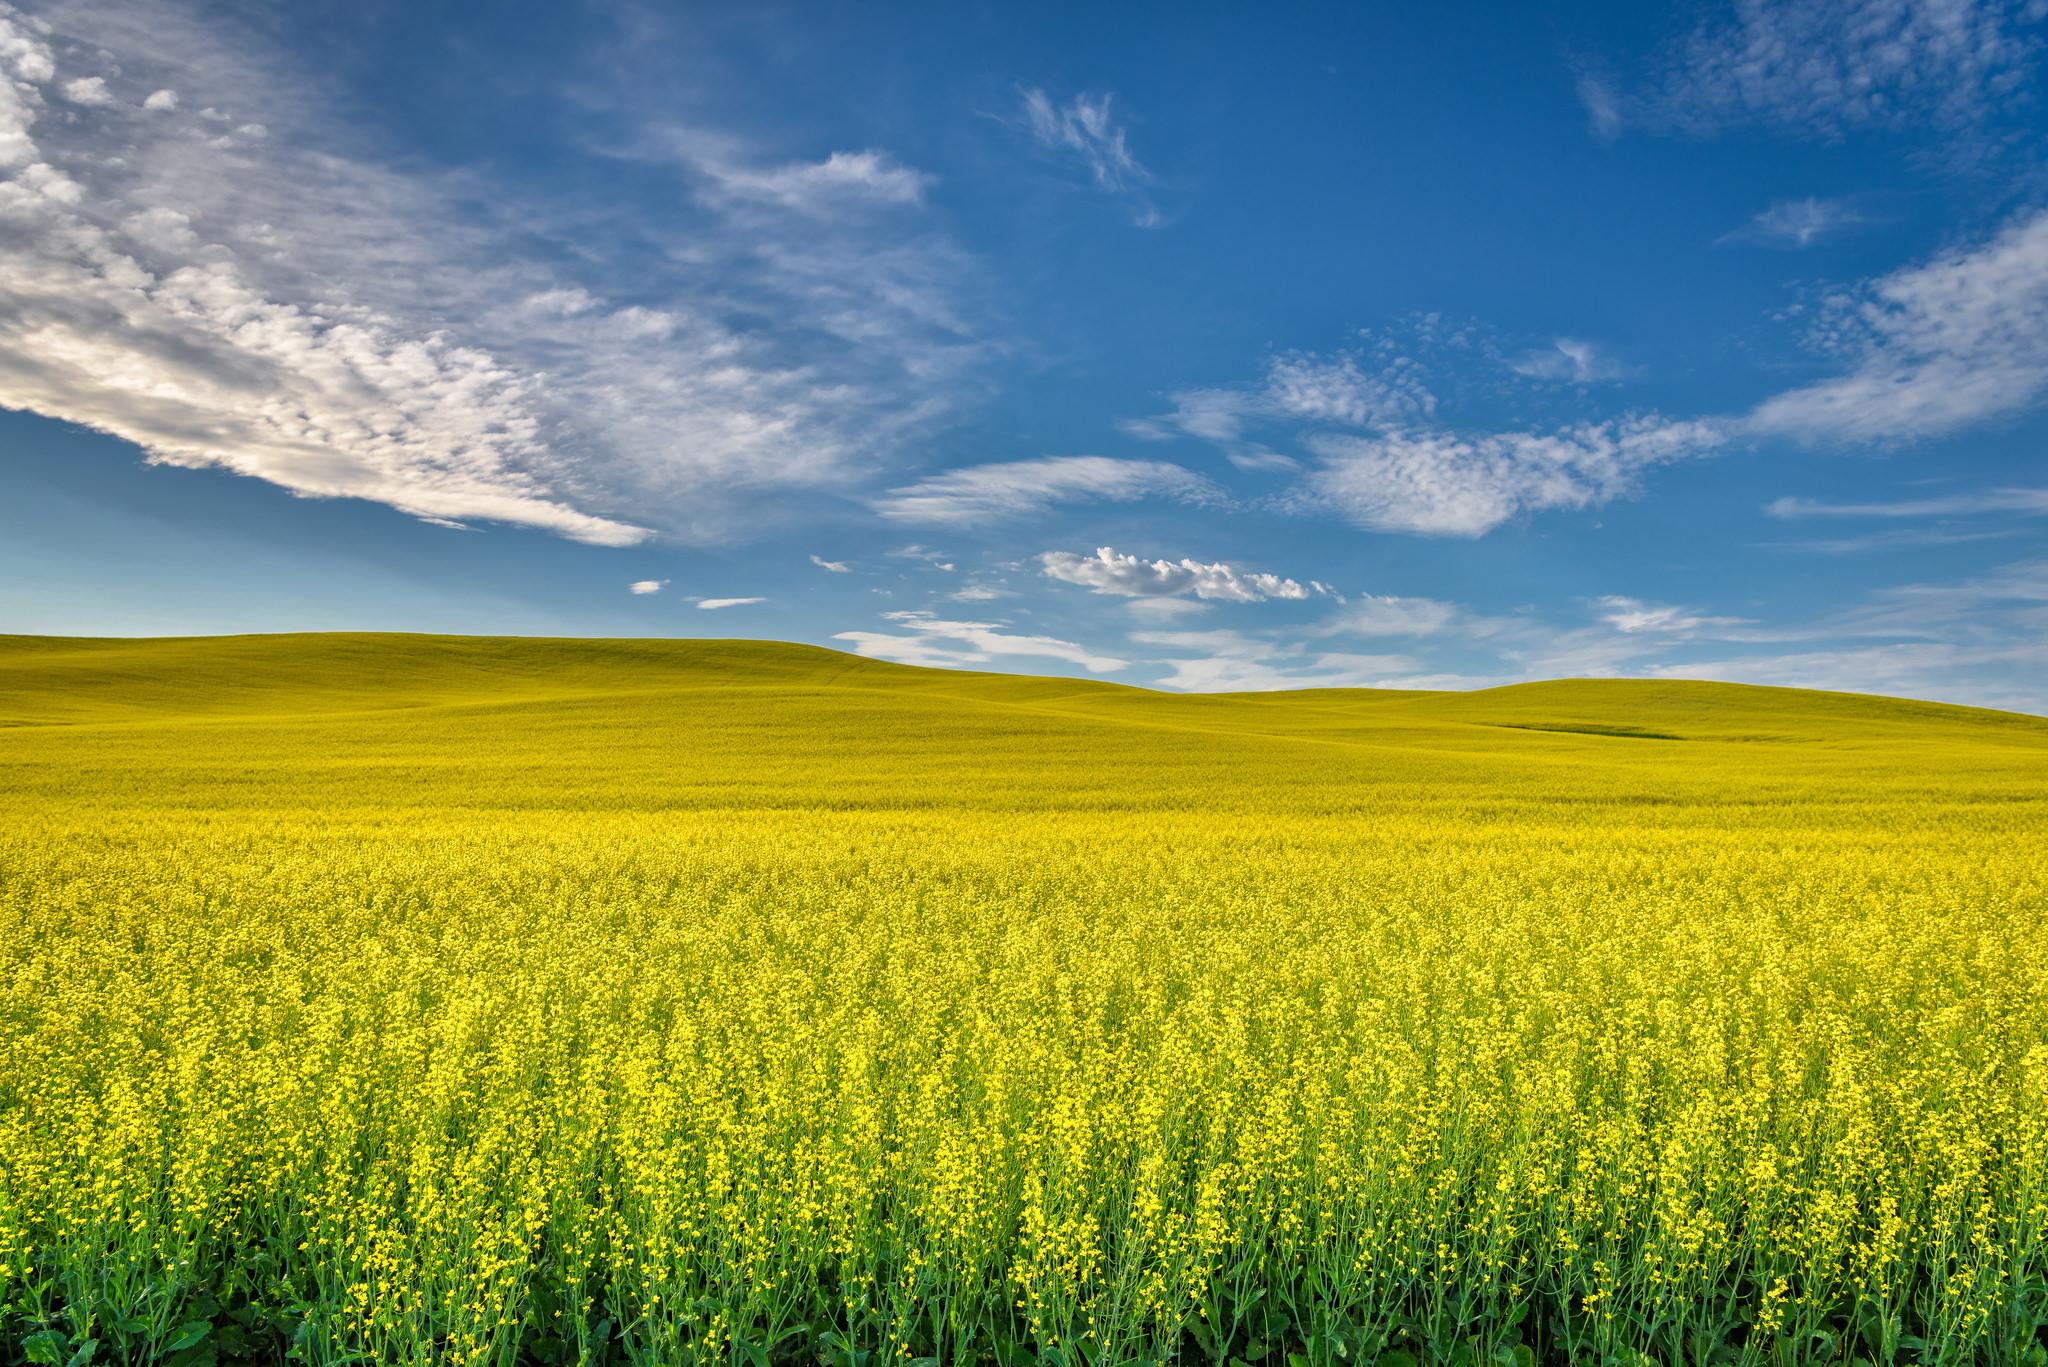 Idaho Farmers Eye Growing Canola Crop In 2018 Boise State Public Radio